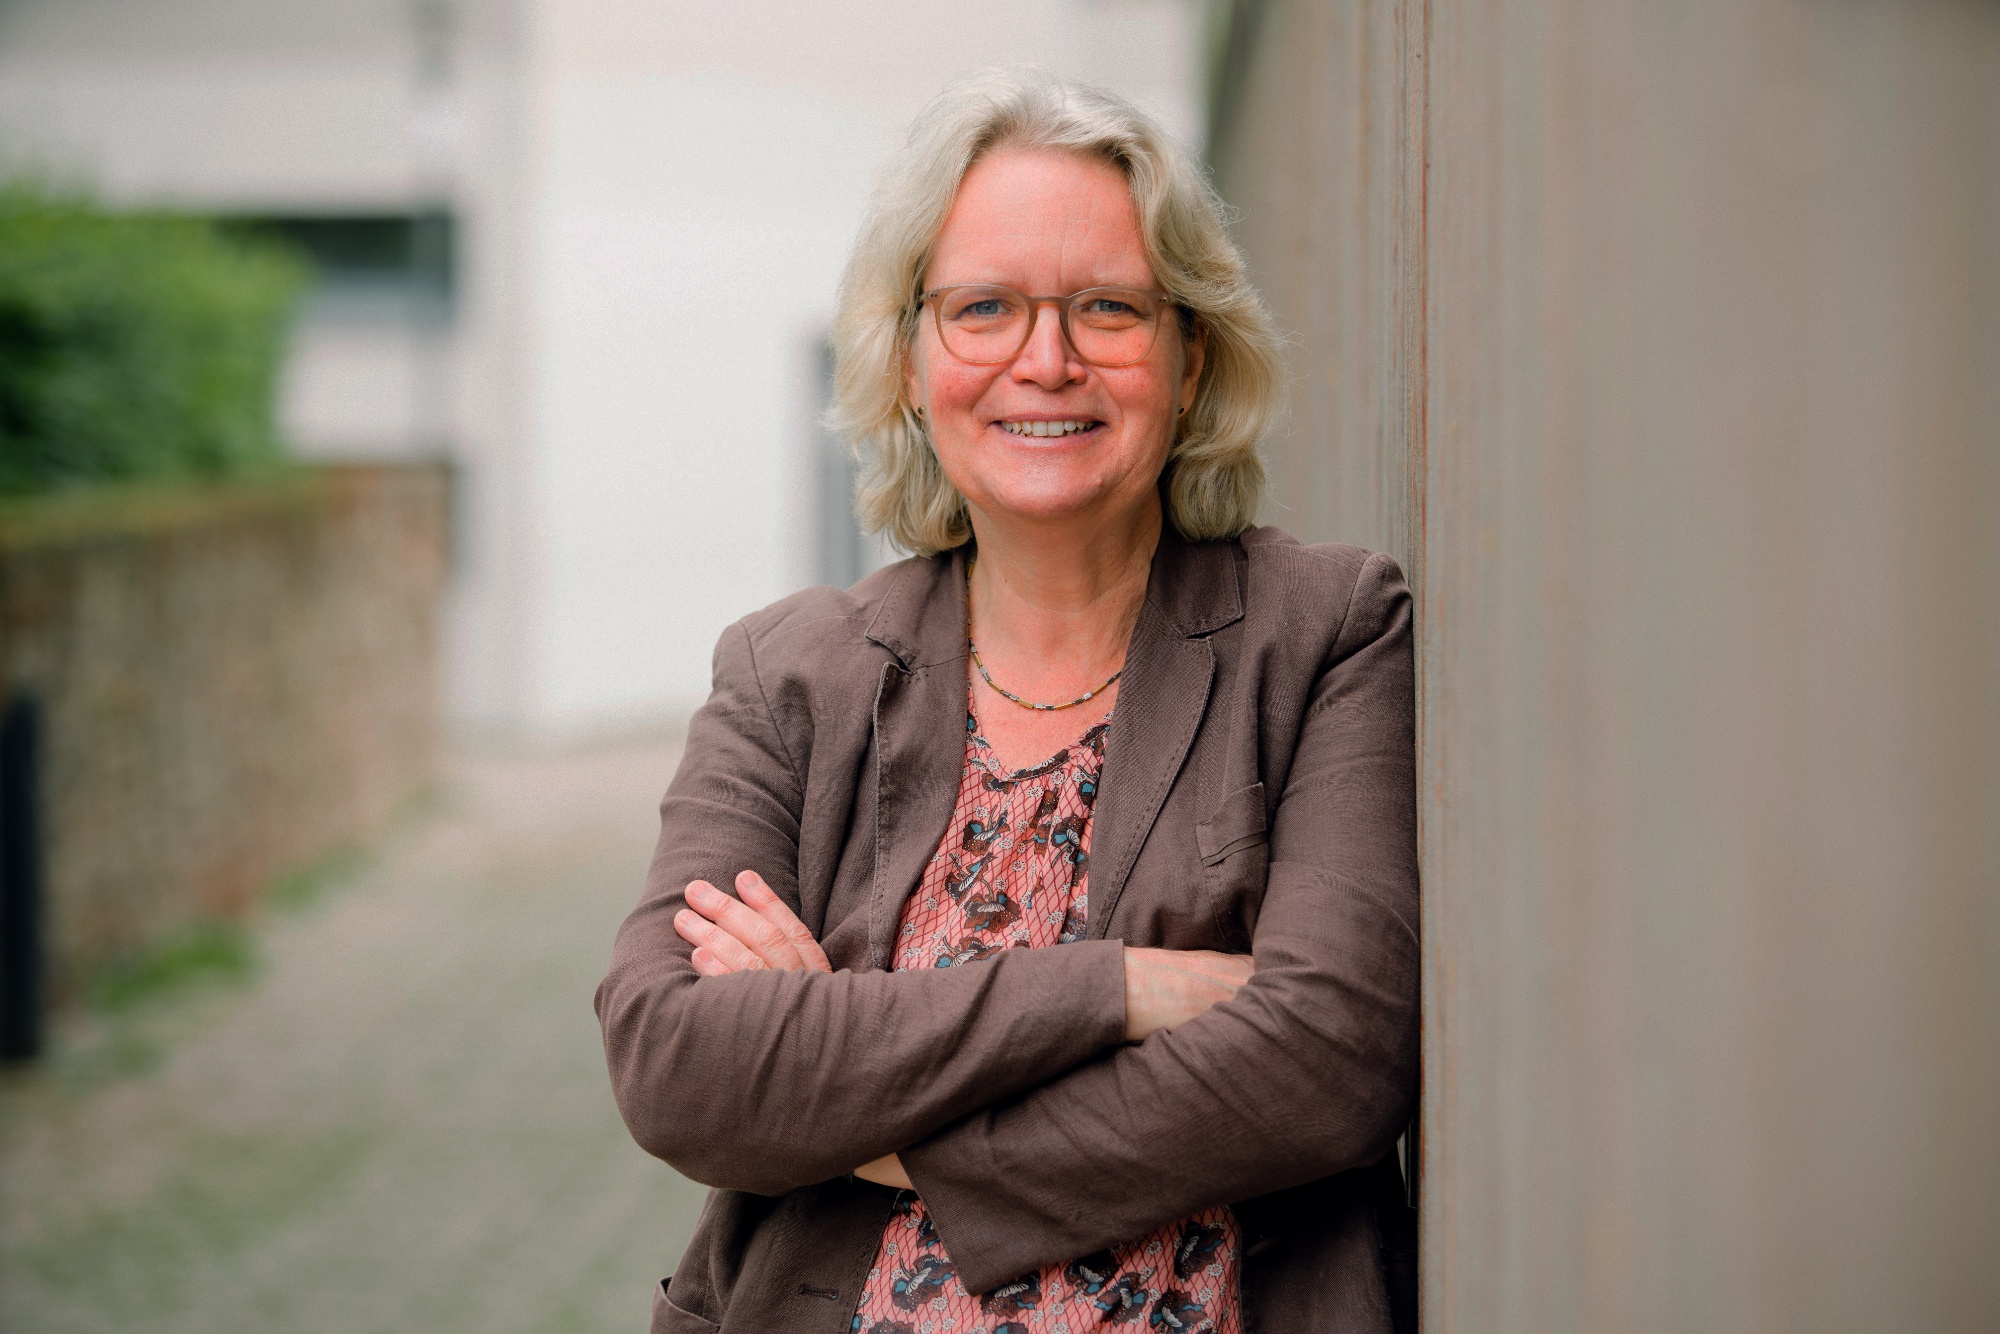 Portrait Bürgermeisterkandidatin Katharina Kleine Vennekate